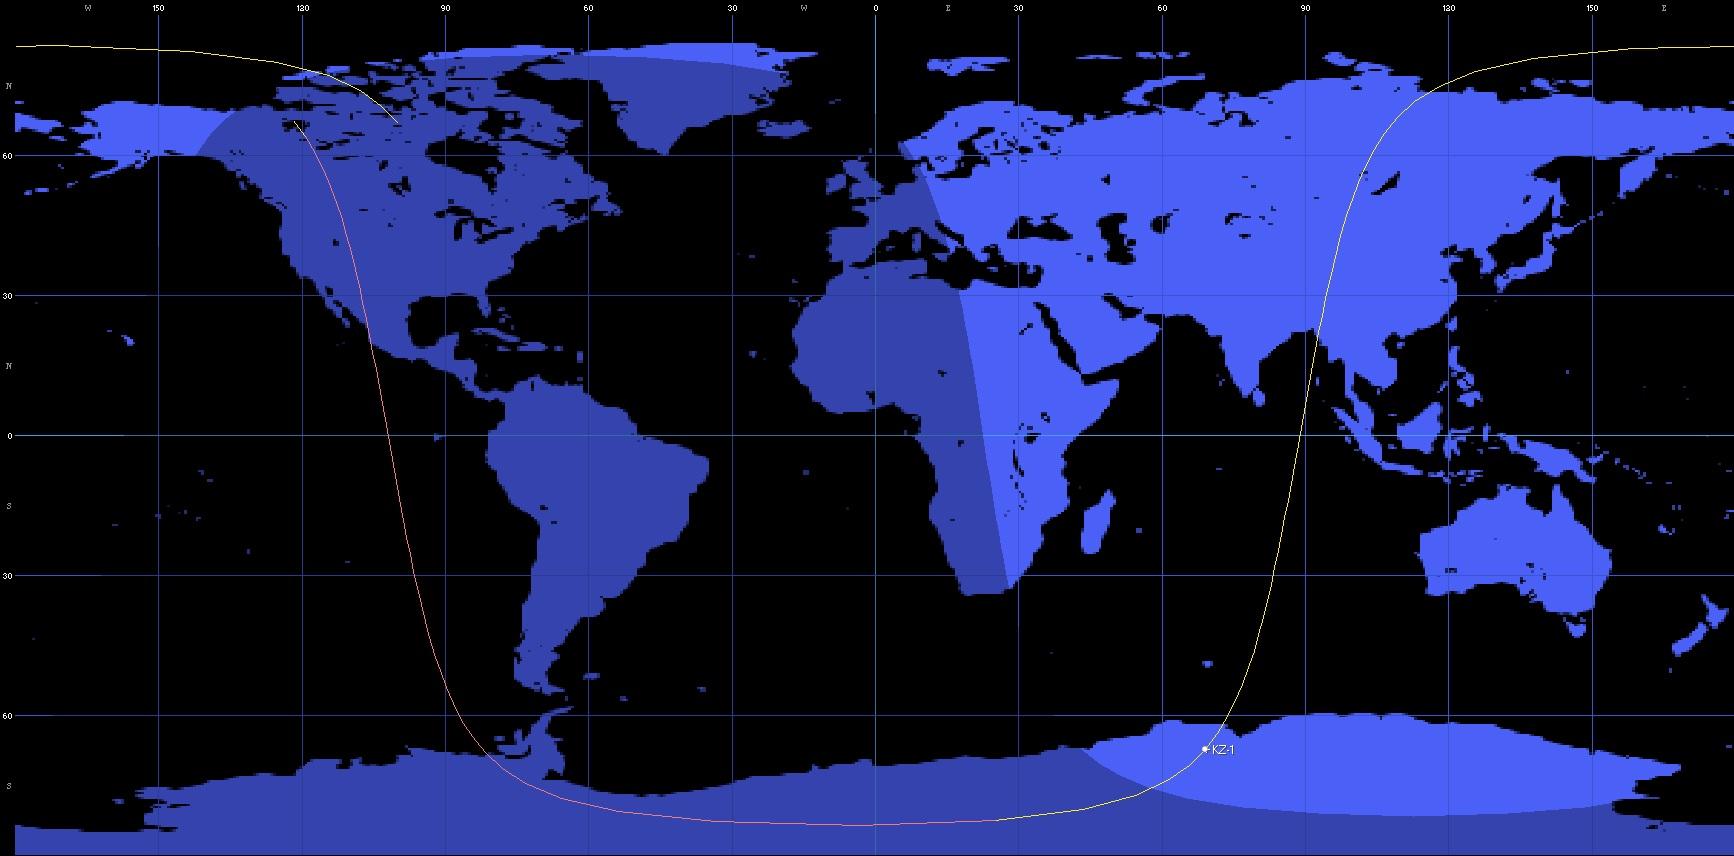 Image: Orbitron/Spaceflight101